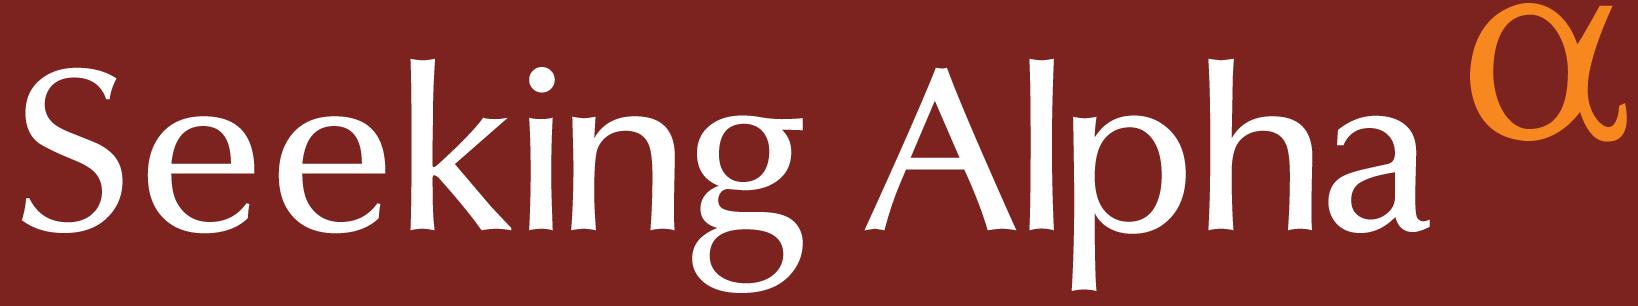 Seeking alpha Logos